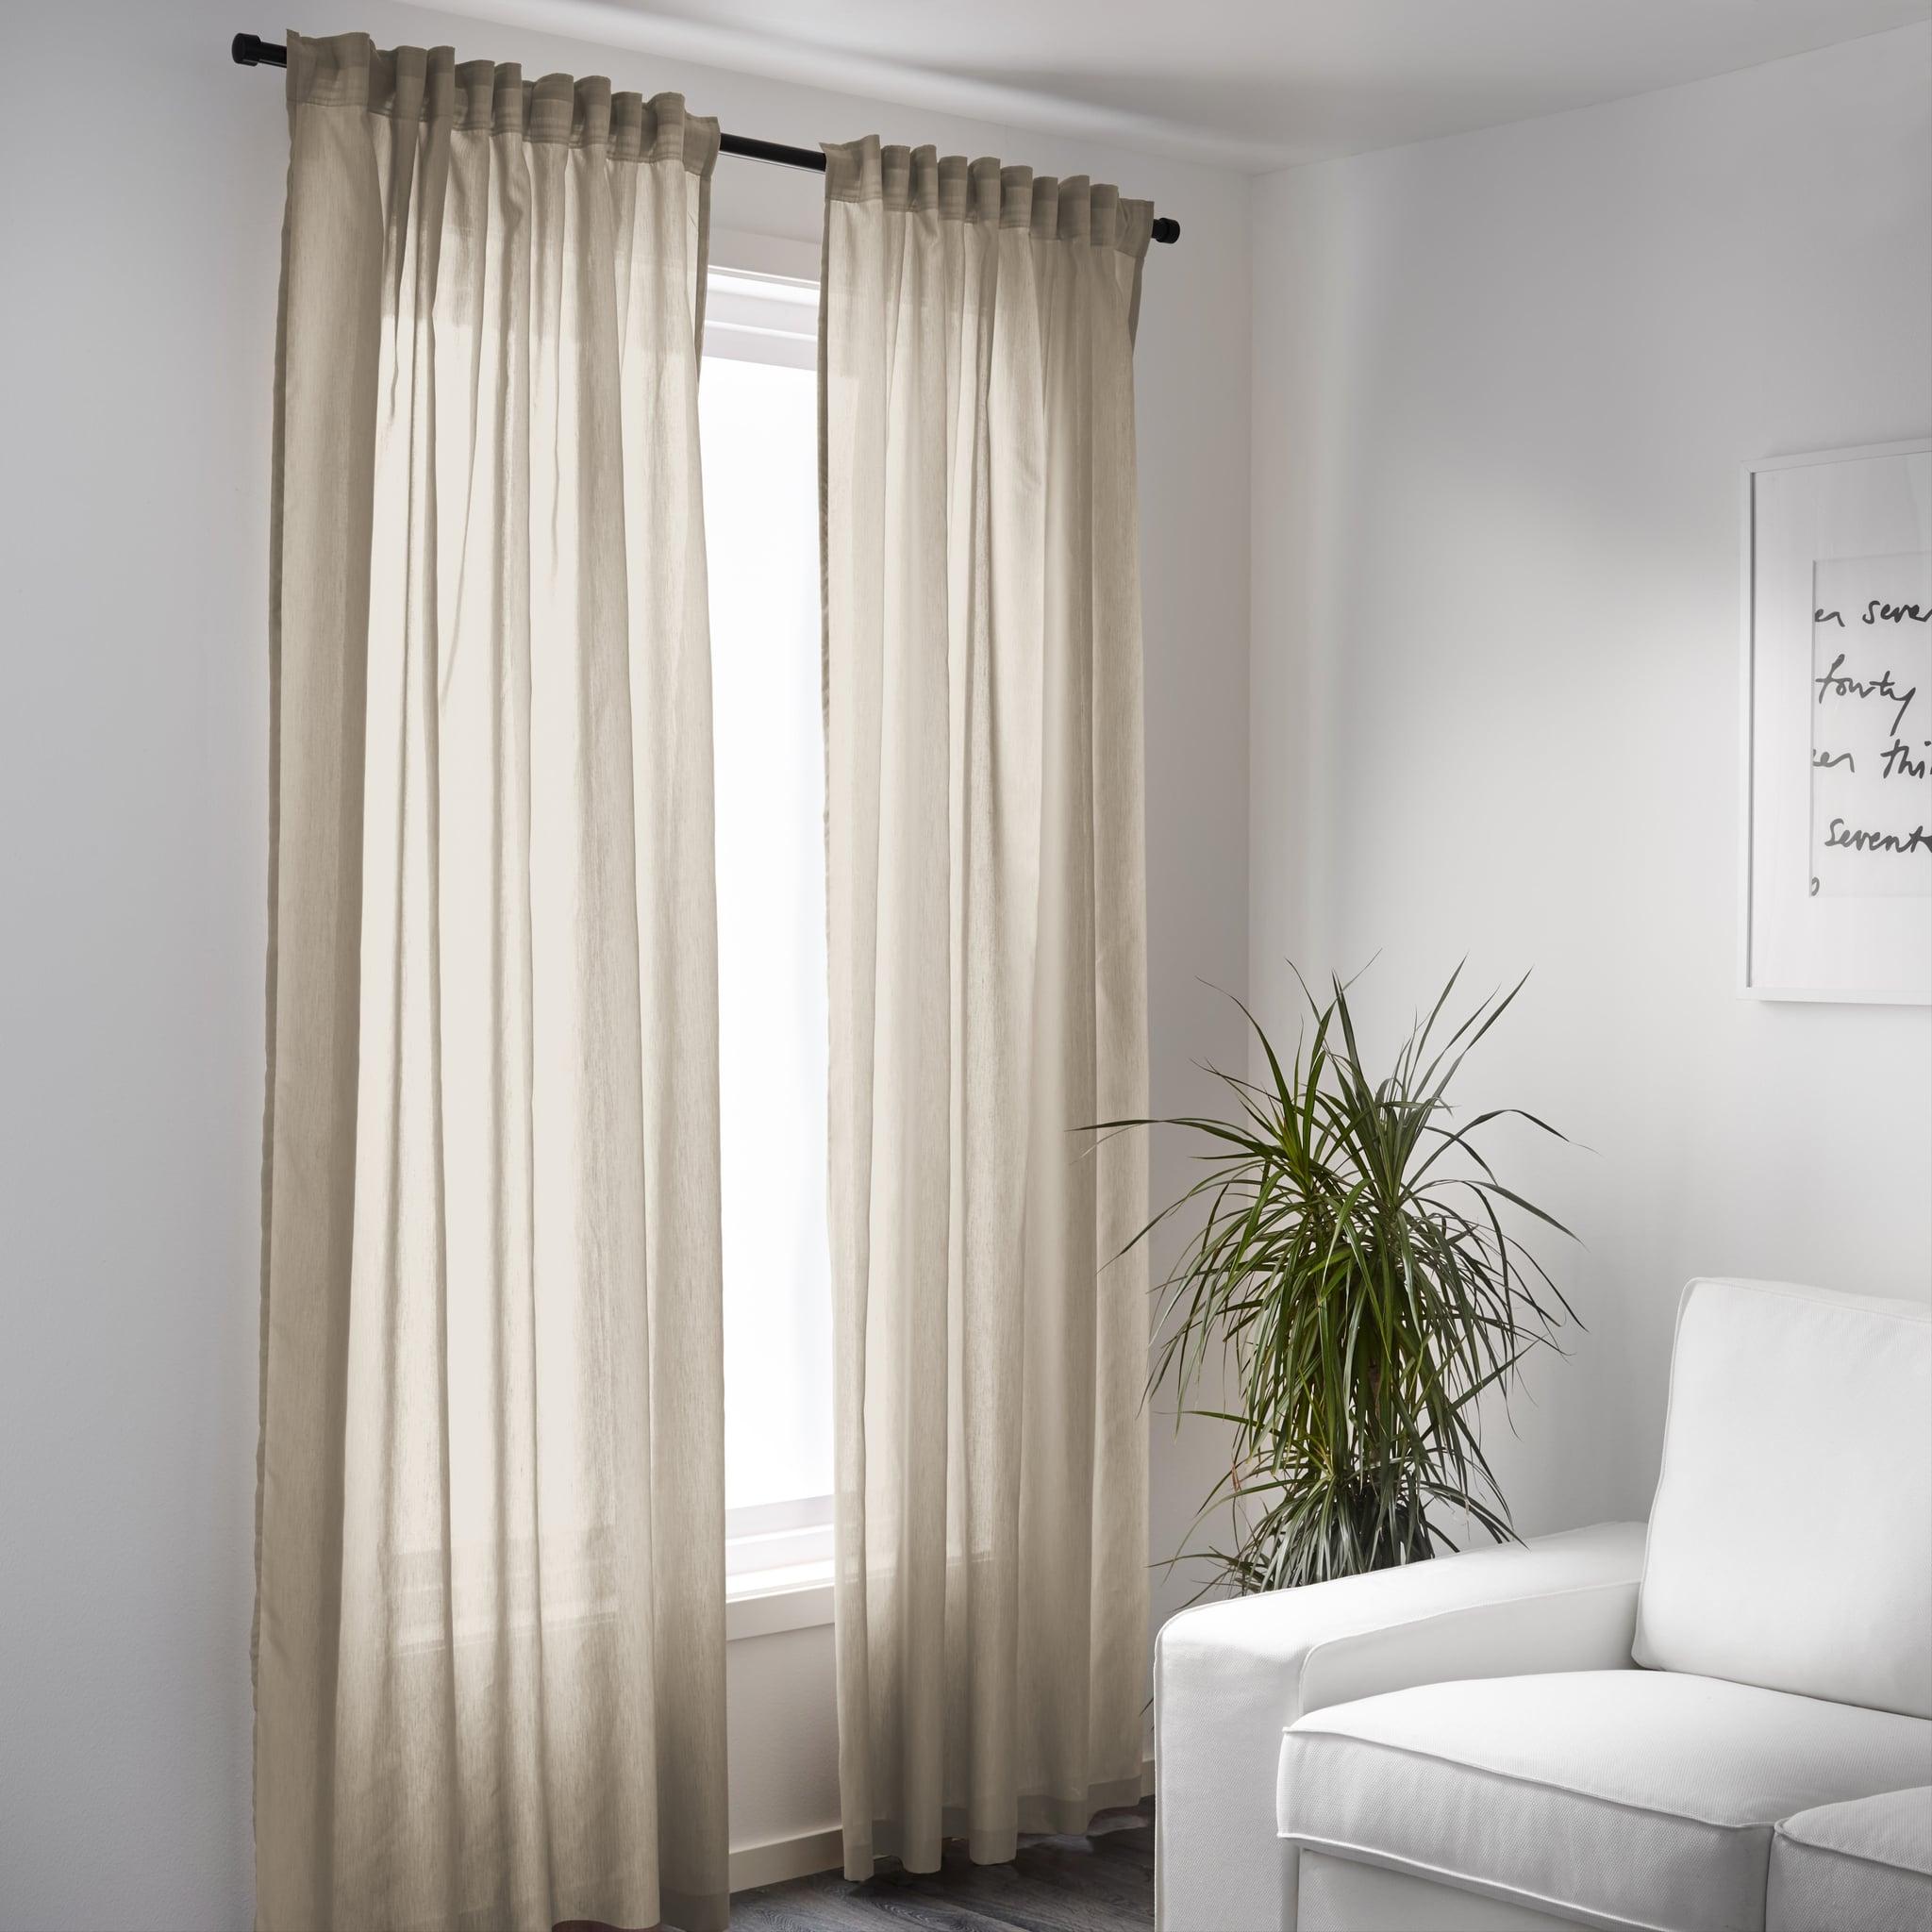 Fixer Upper Curtain Panels Transculent Curtains Get The Fixer Upper